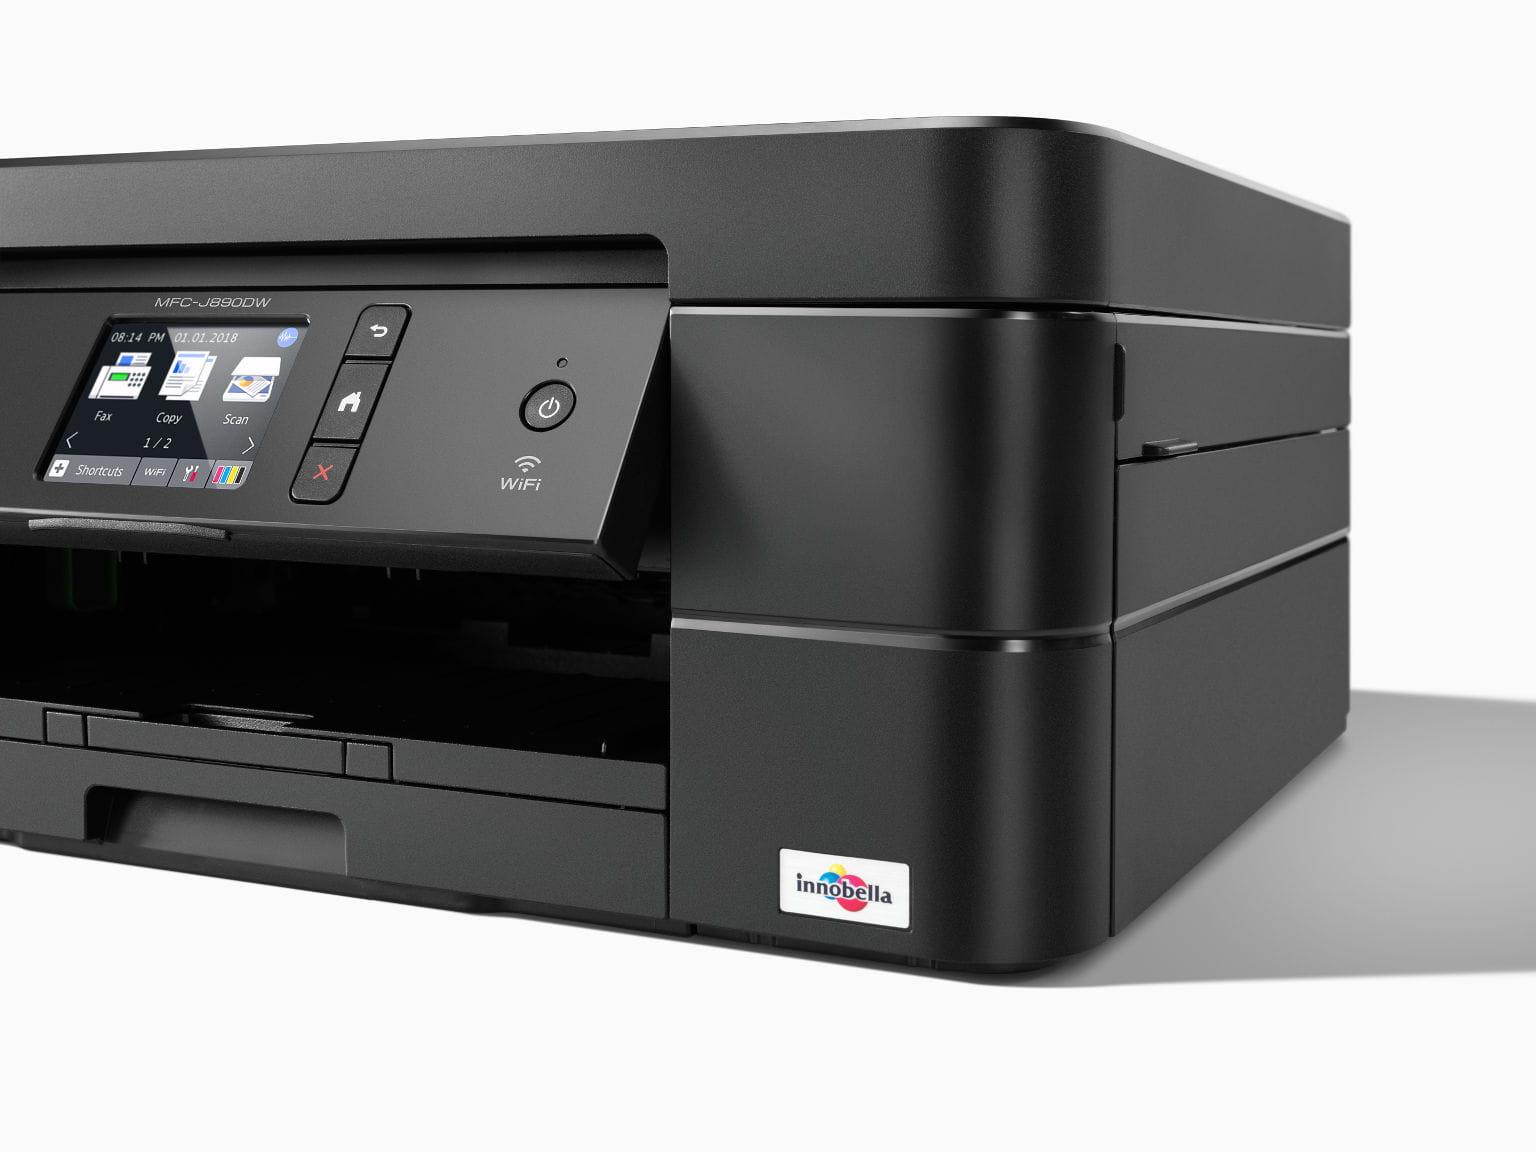 Impressora Multifuncional de Tinta Brother MFC-J890DW